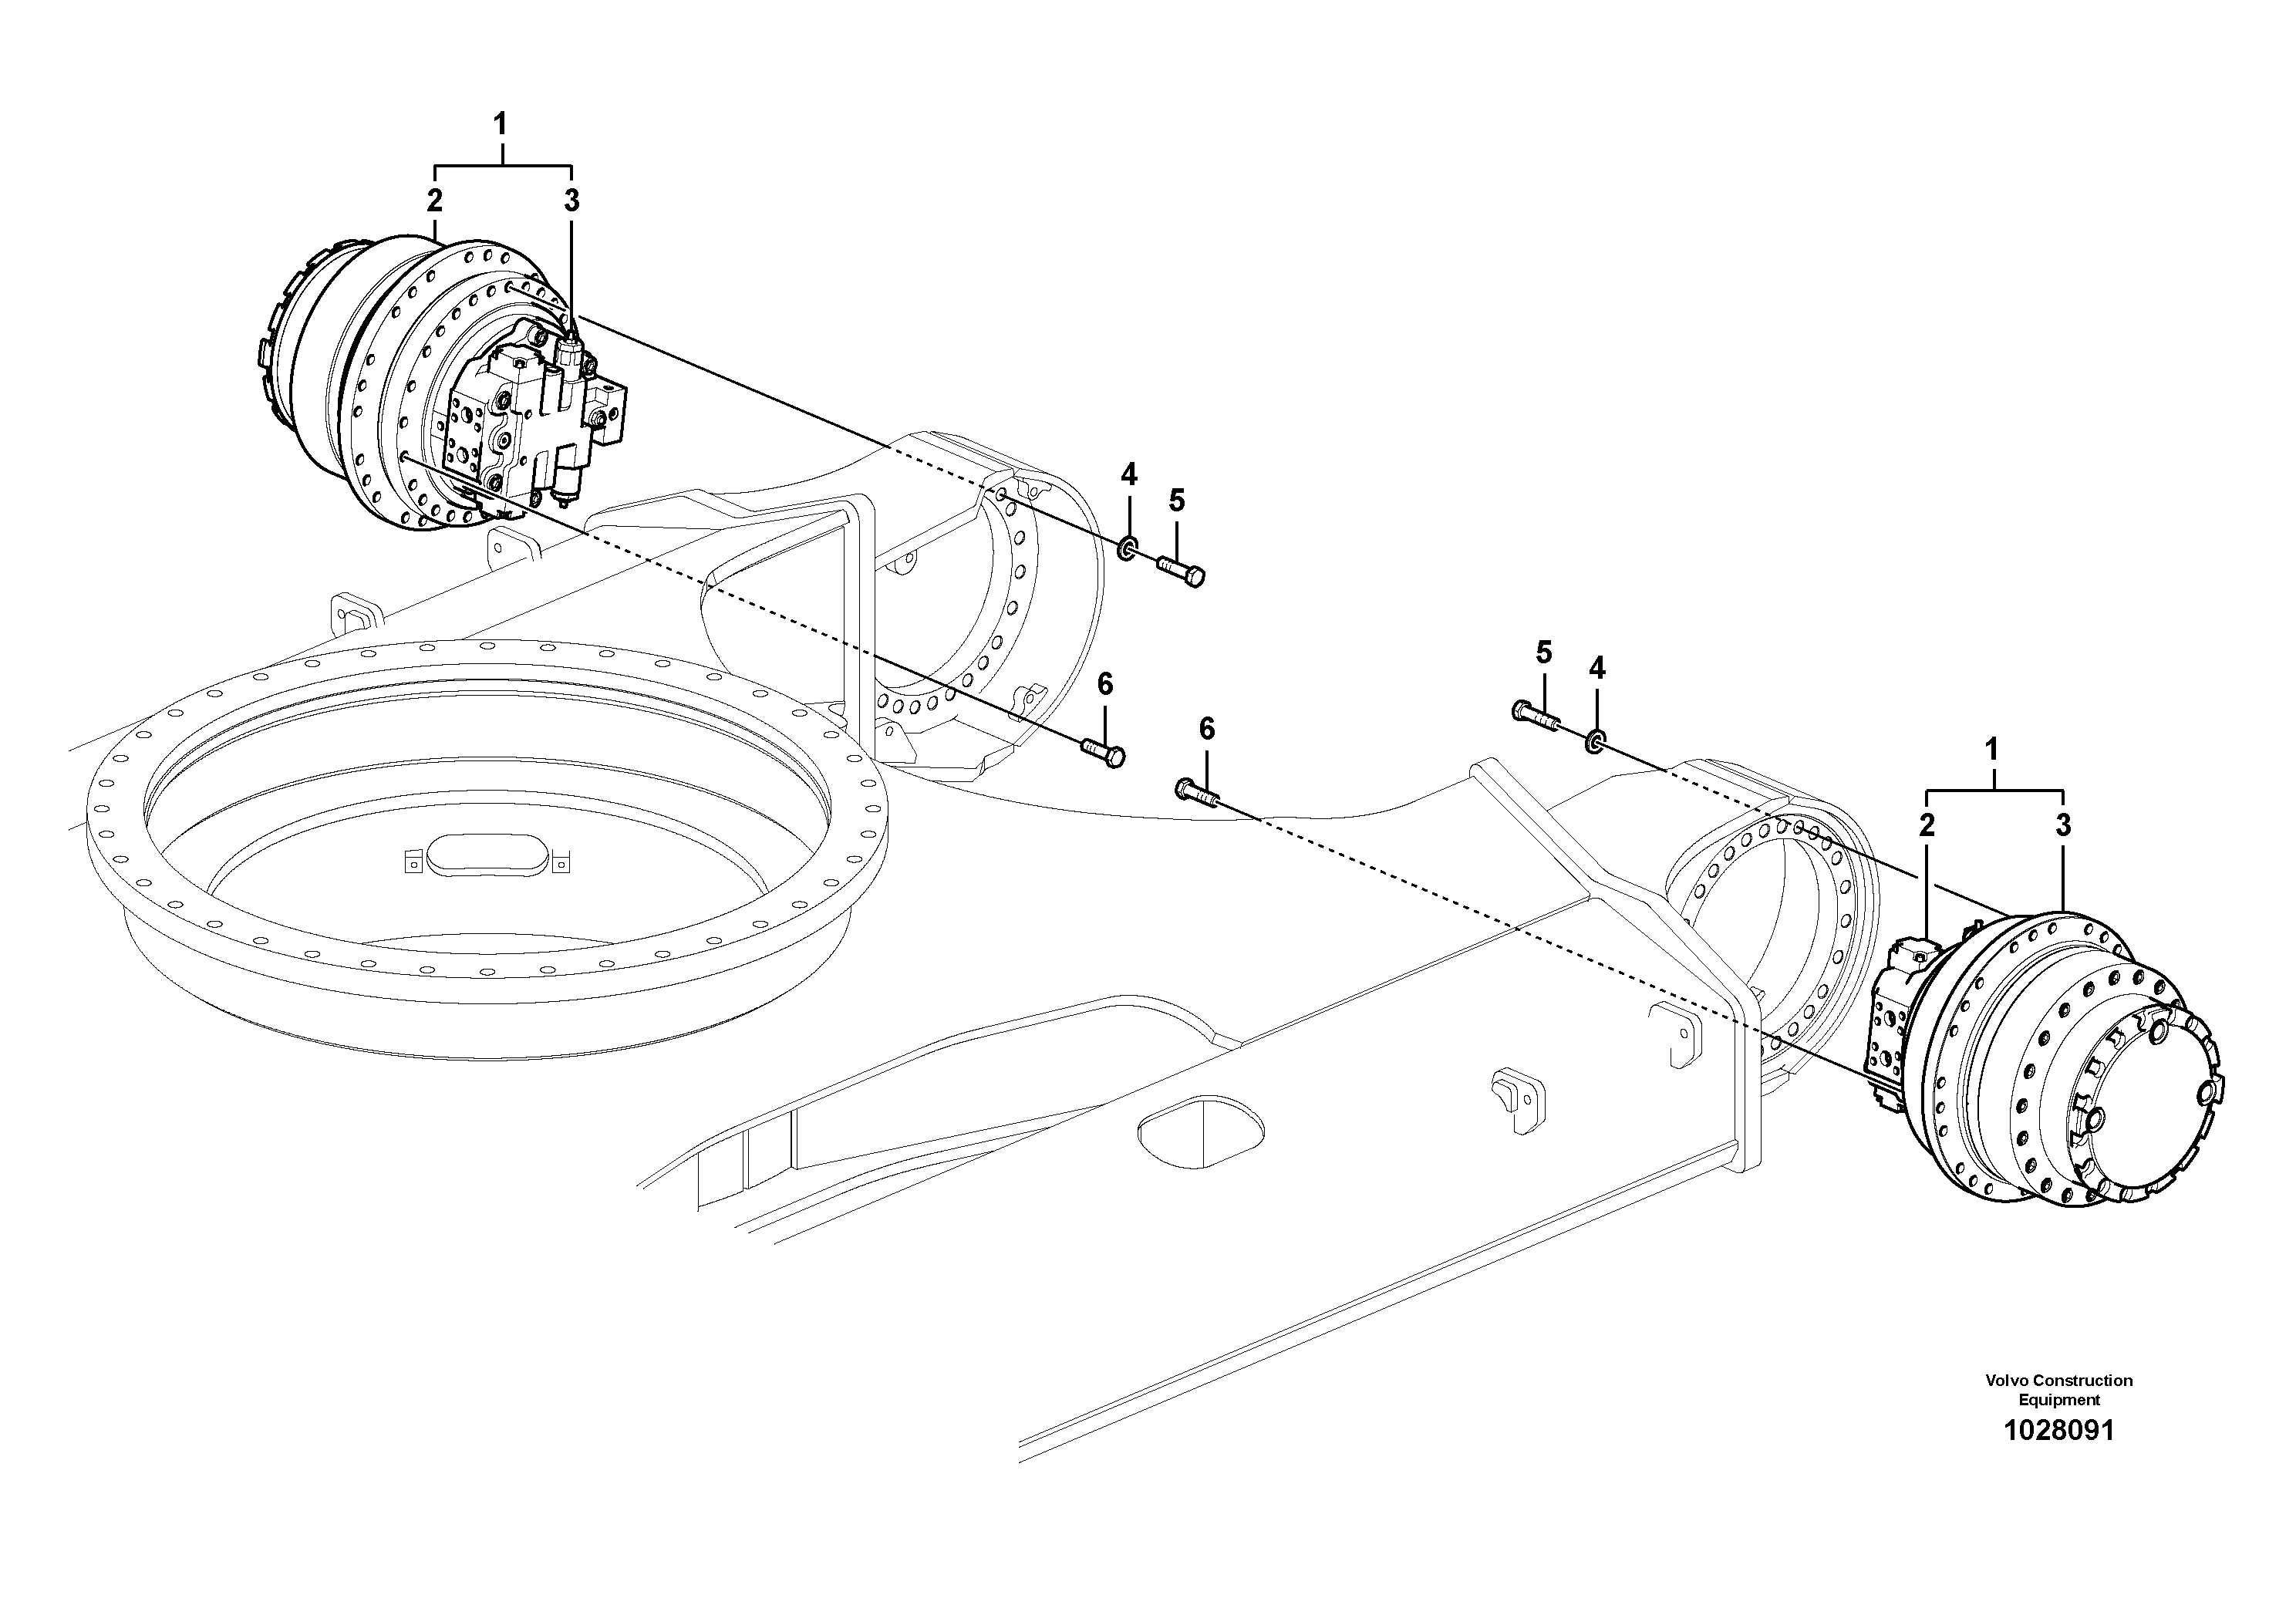 ekskavator-yuruyus-motoru